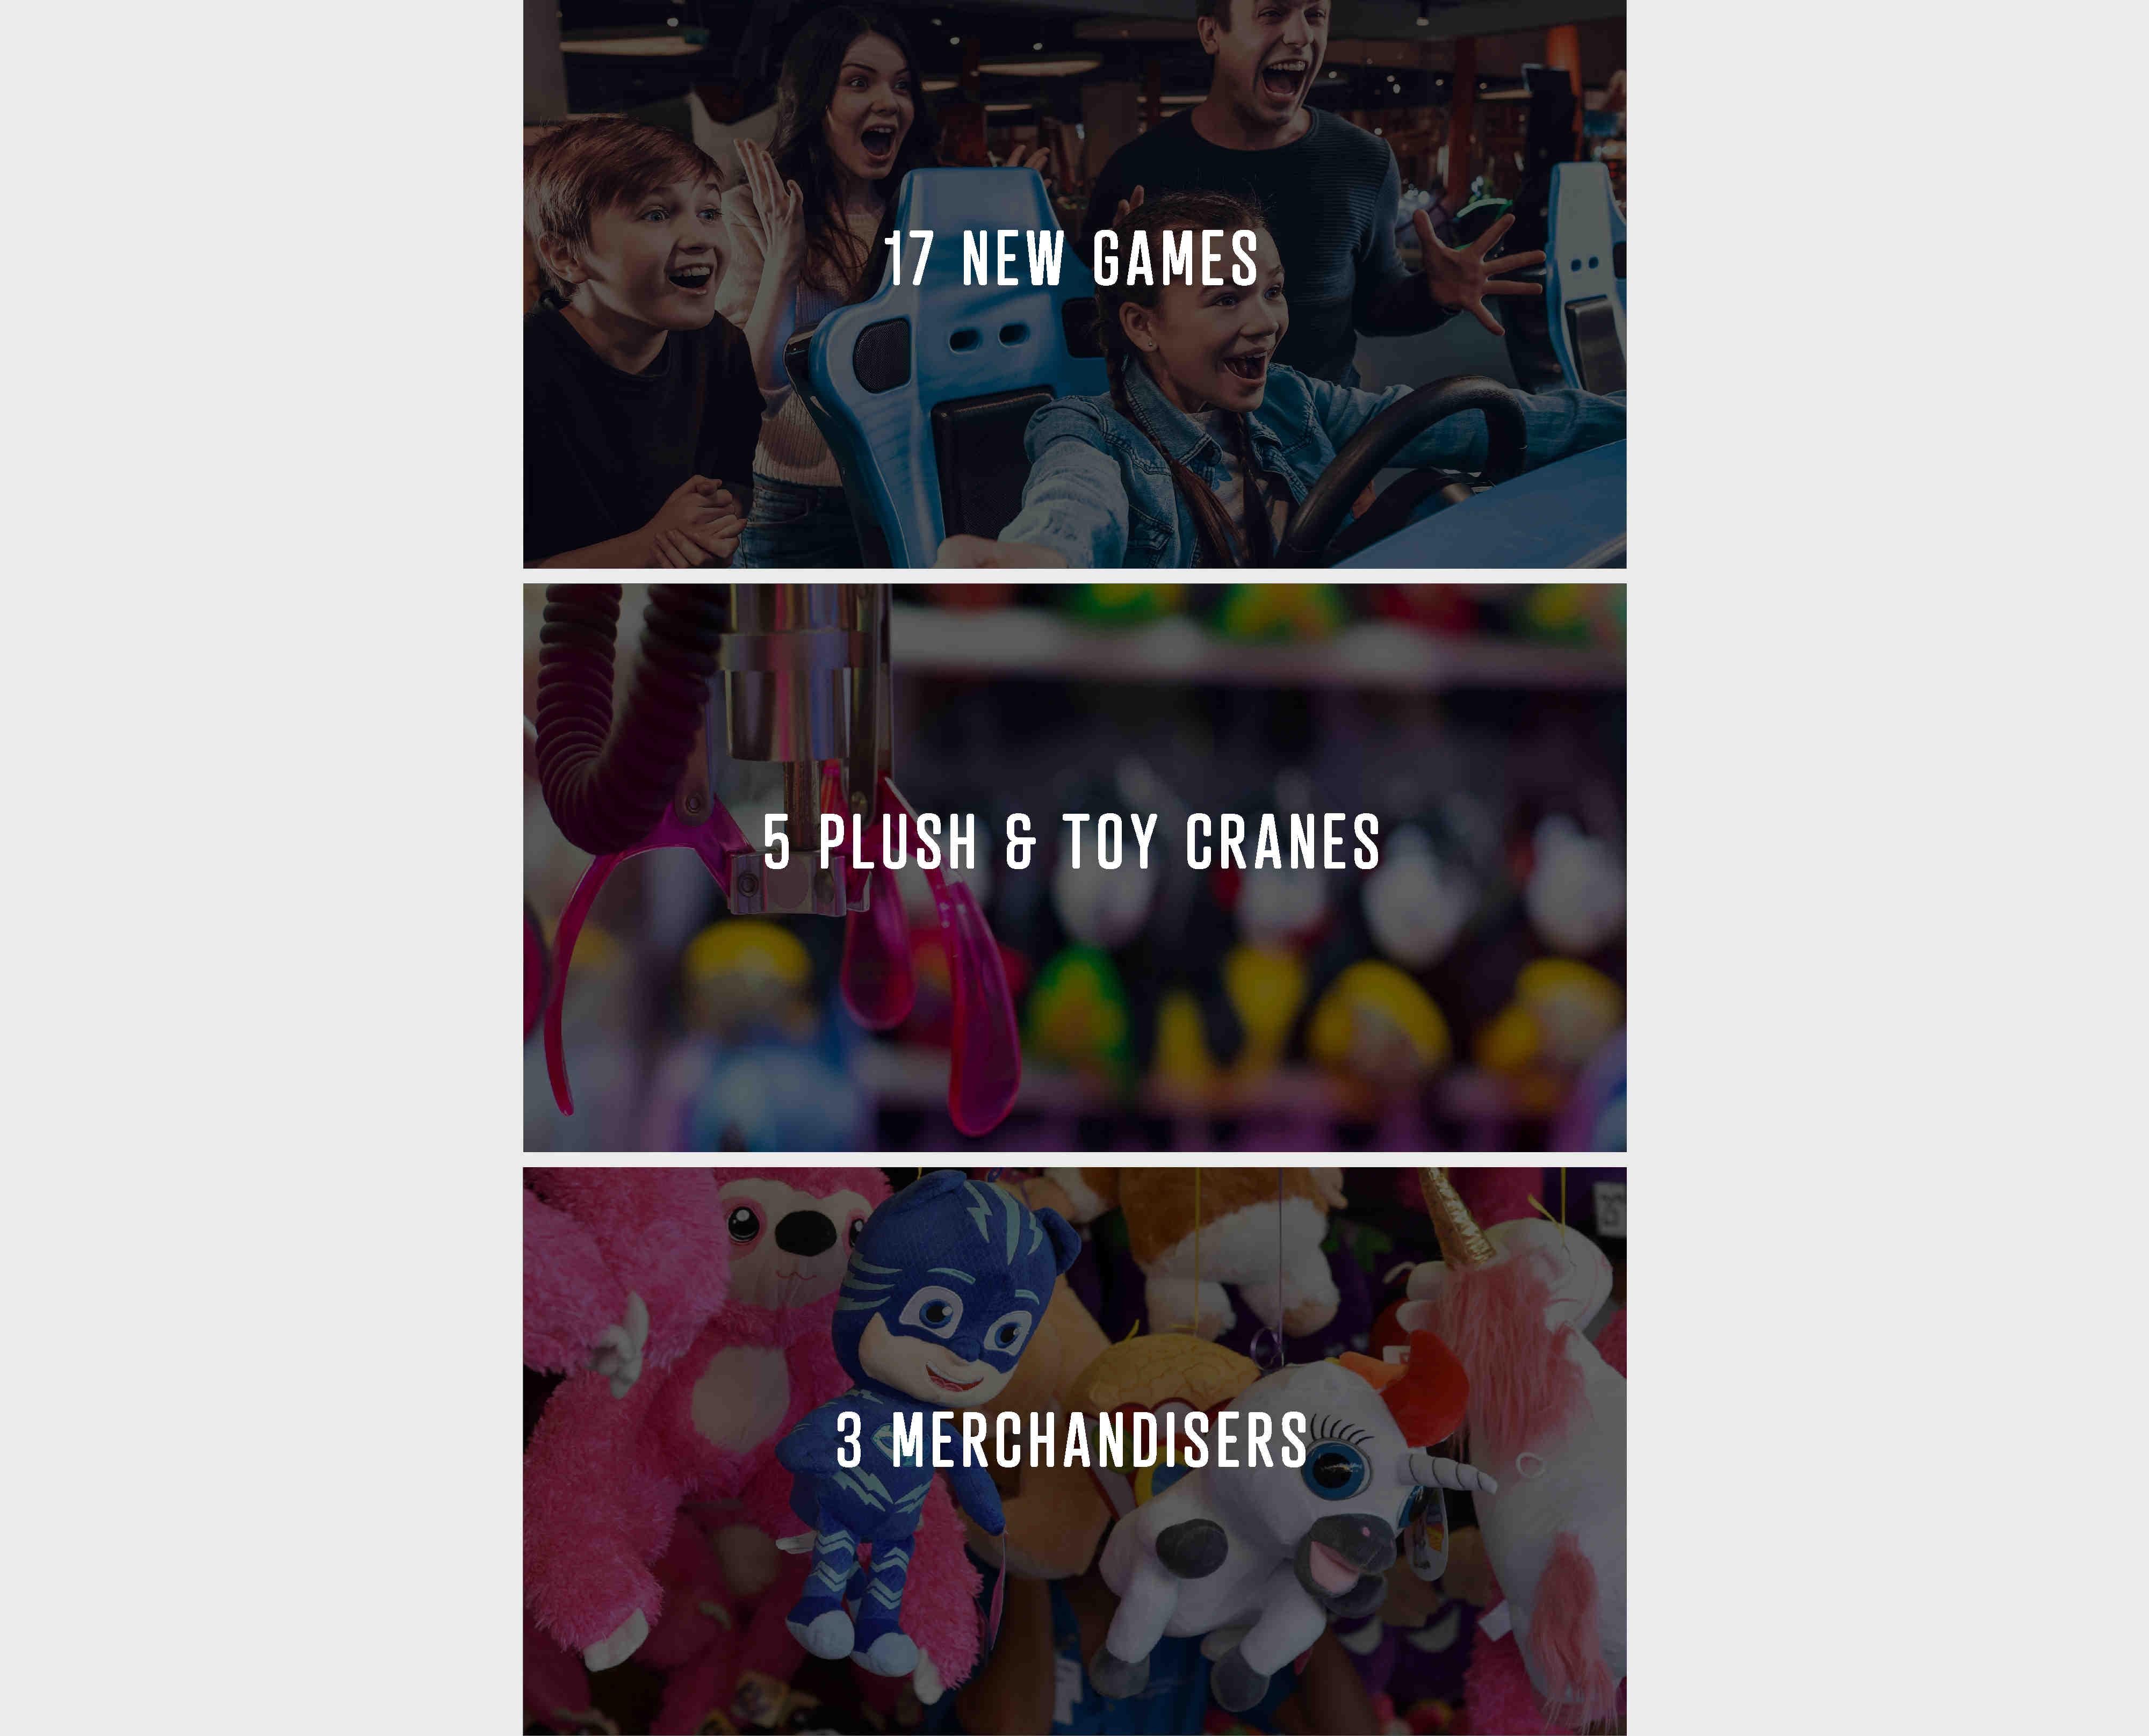 Arcade information